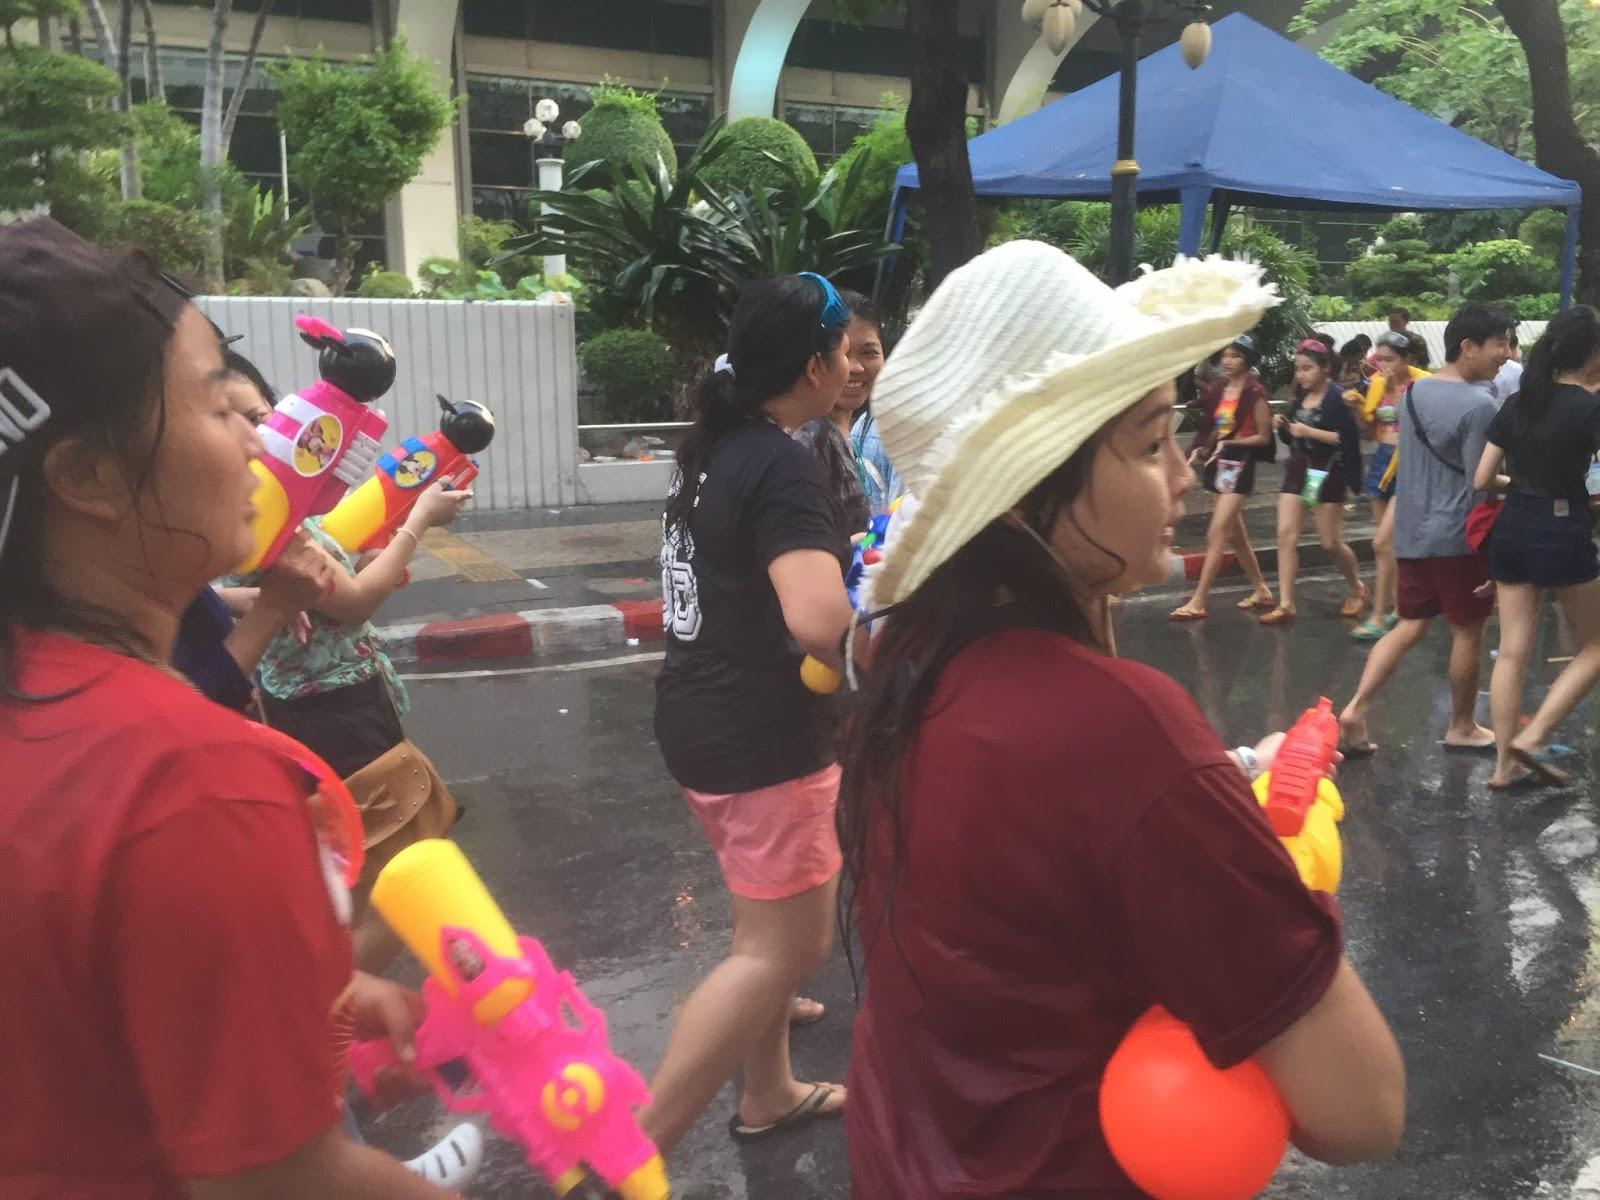 Songkran, Bangkok Songkran, thai water festival, thailand songkran, water festival thailand, water festival 2015, songkran 2015, songkran 2016, dongkran 2017, songkran 2018, thajsko, vodní festival thajsko, songkran vodní festival, vodní festival thajsko, dovolená thajsko, thajské svátky, thajský svátek vody, bangkok thajsko, bangkok thailand, dovolená na vlastní pěst, dovolená bez cestovky, fashionhousecz blog, fashion house cz, fashionhouse, fashionhouse blog, blog cestování, blog o cestování asie, kristýna vacková, kristýna blog, kristýna vacková blog, thajsko duben, počasí thajsko, thailand april, weather in thailand,